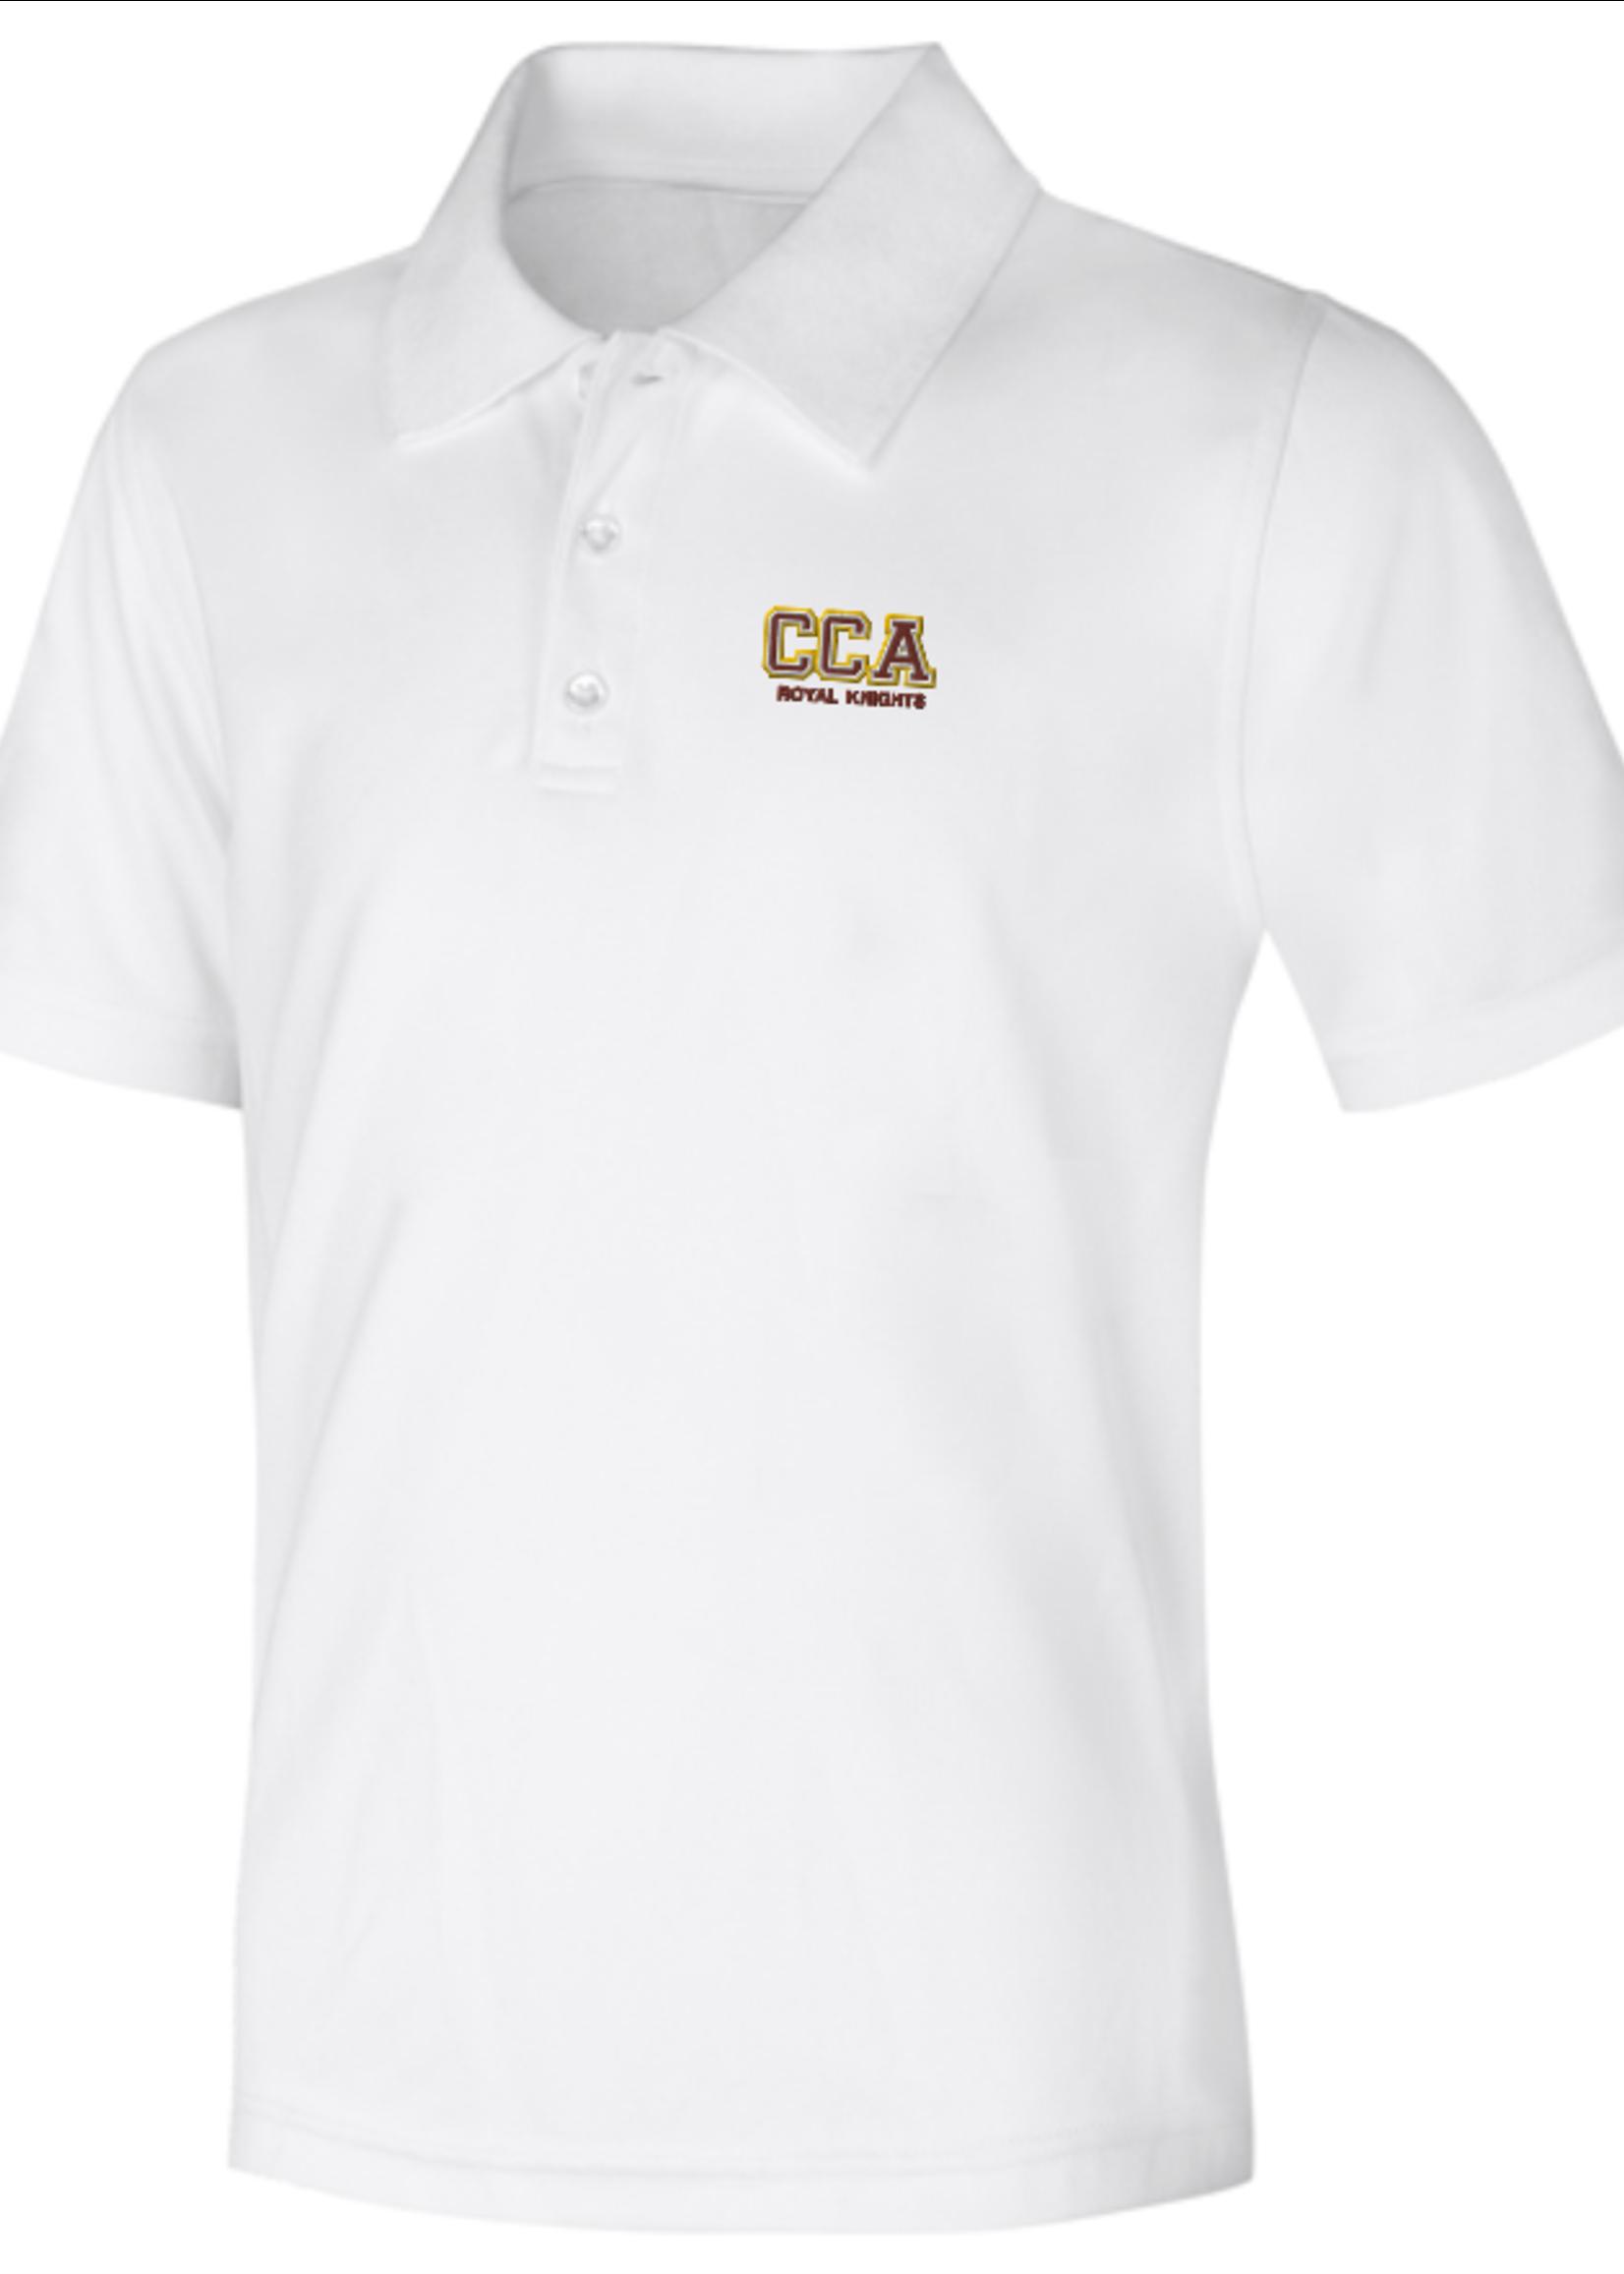 TUS CCA White DryFit Short Sleeve Polo Shirt